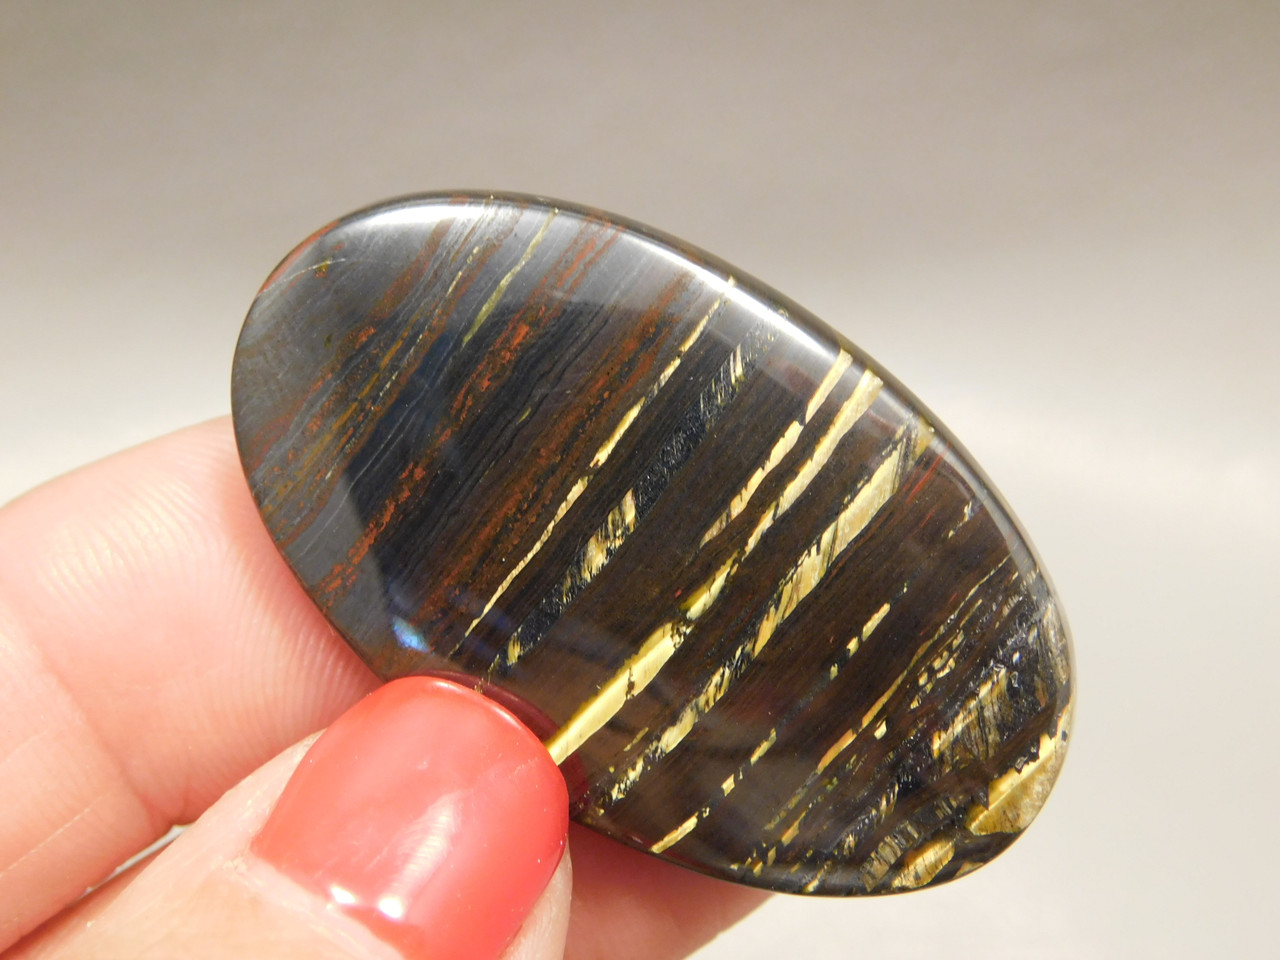 Tiger Iron Semi Precious Gemstone Designer Cabochon #7